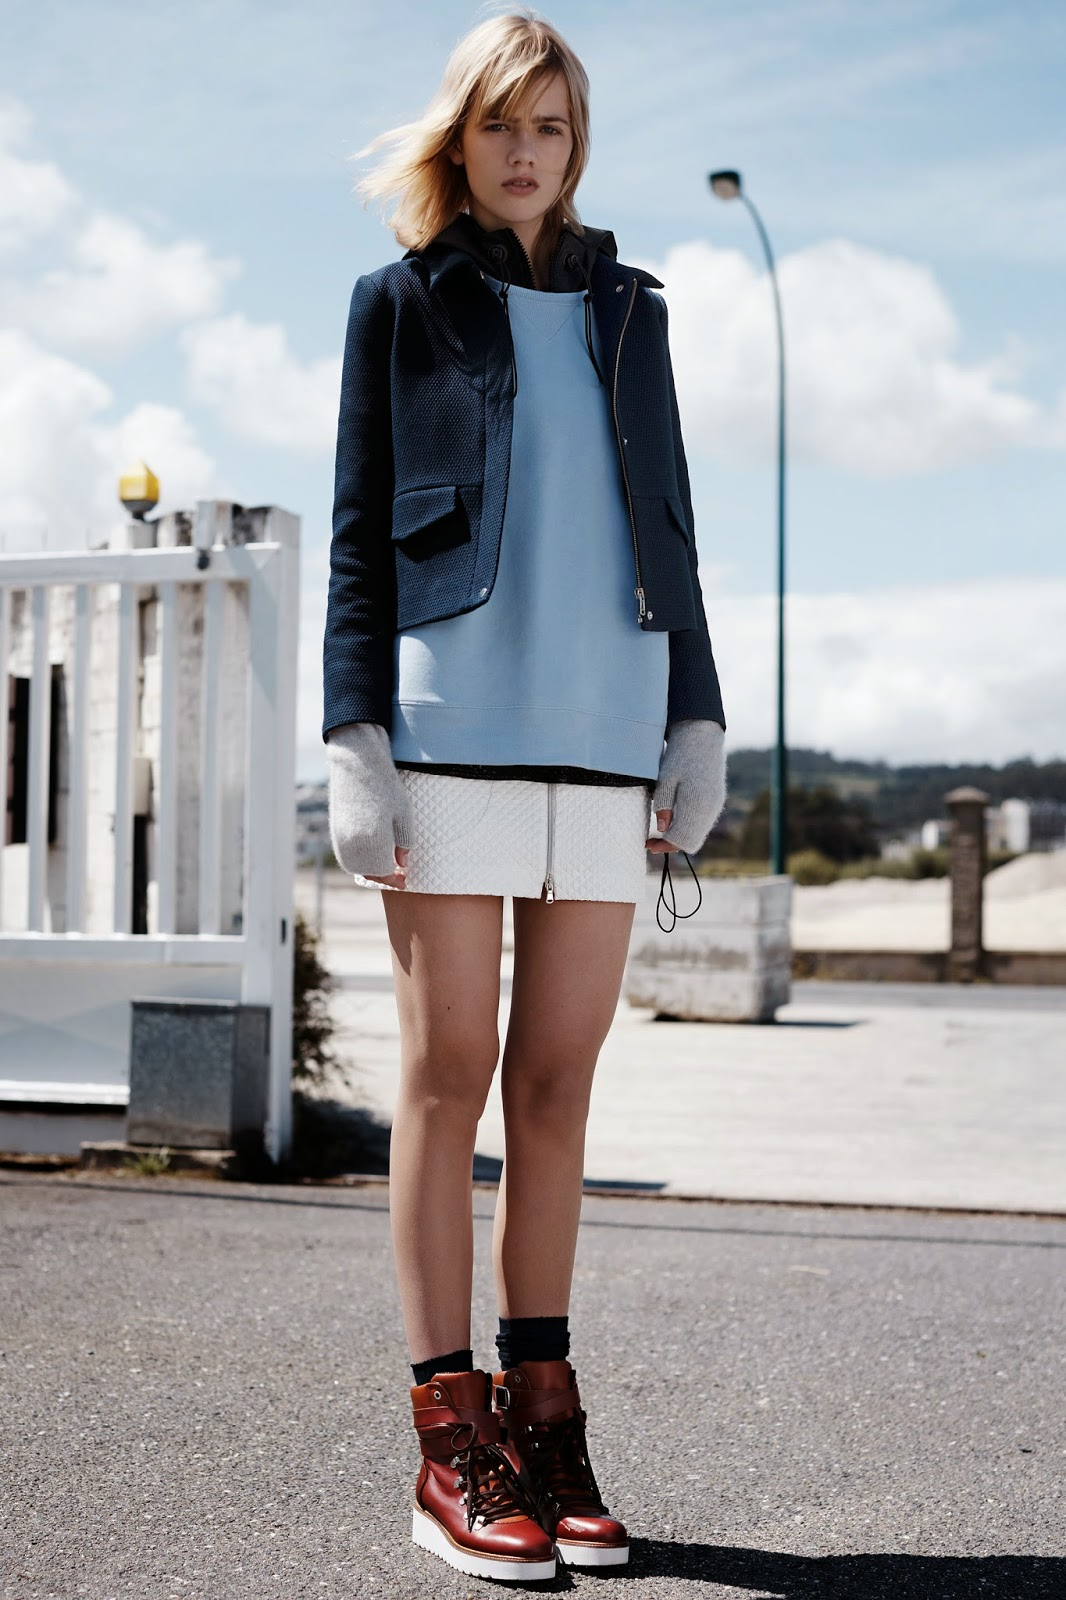 Tendencias AW14/15, Lookbook Trafa, Zara, Normcore, Style, Street Style, Fashion Styles, Cool, Códigos de estilo en la calle, Skirt, Dress, Pants, Boots, Shopping Bag, Shoes, Blucher,